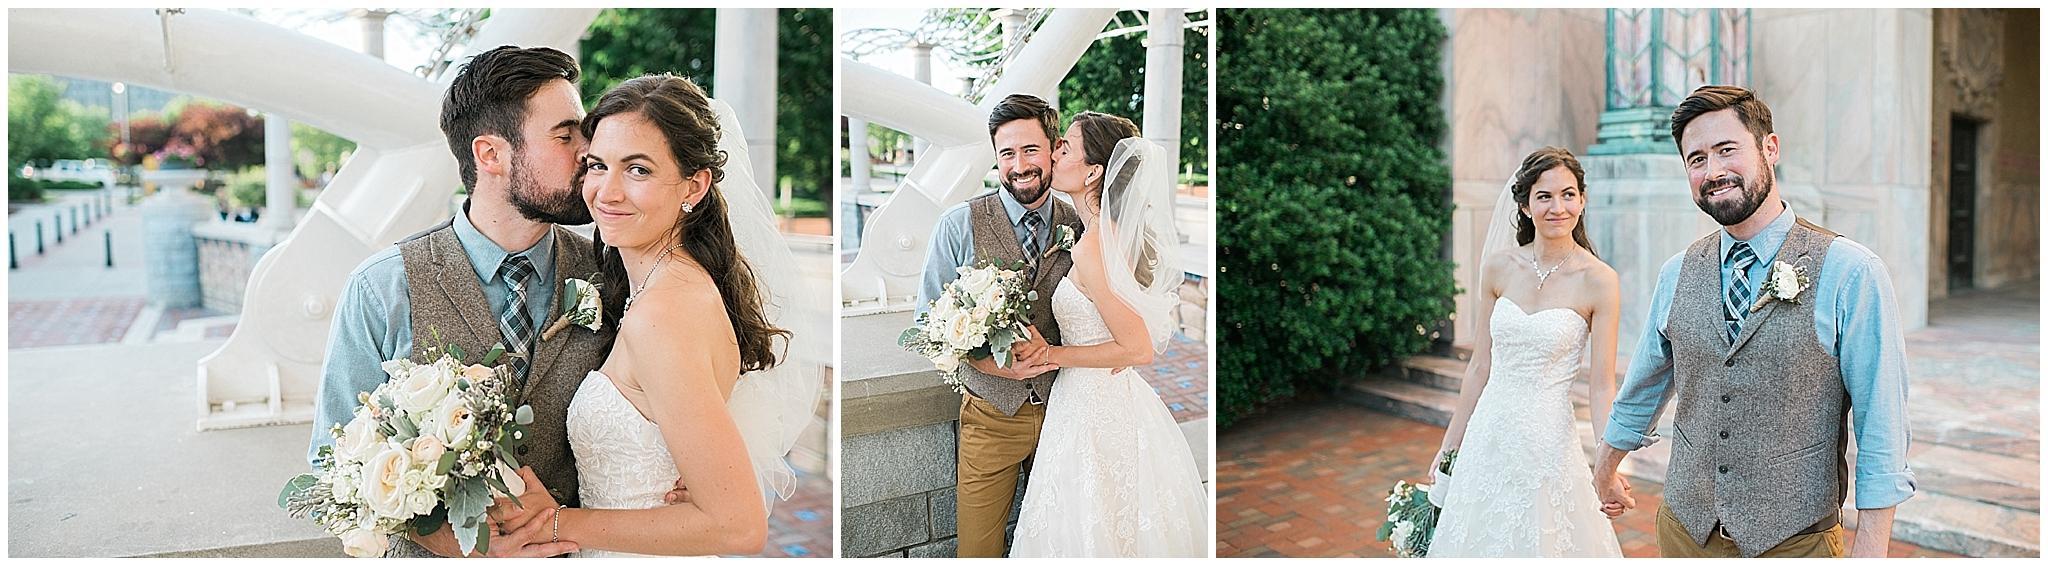 Wedding_Asheville_Century_Room_16.jpg